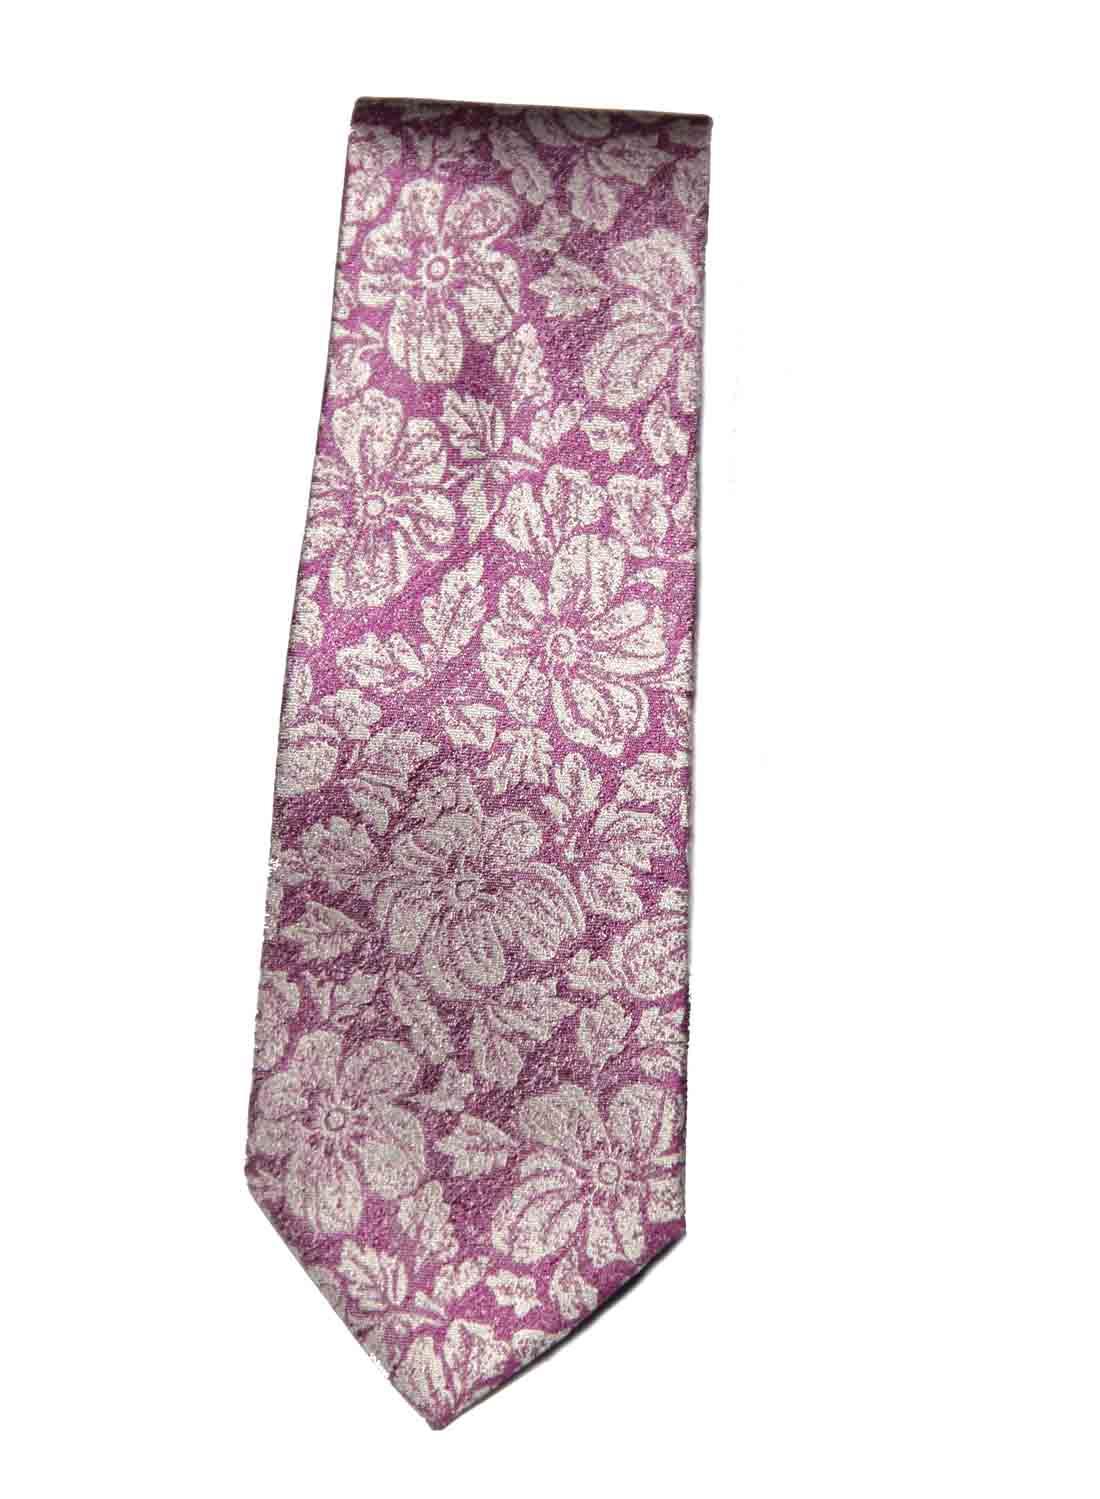 Ted Baker Silk Tie Pink White Floral Men's